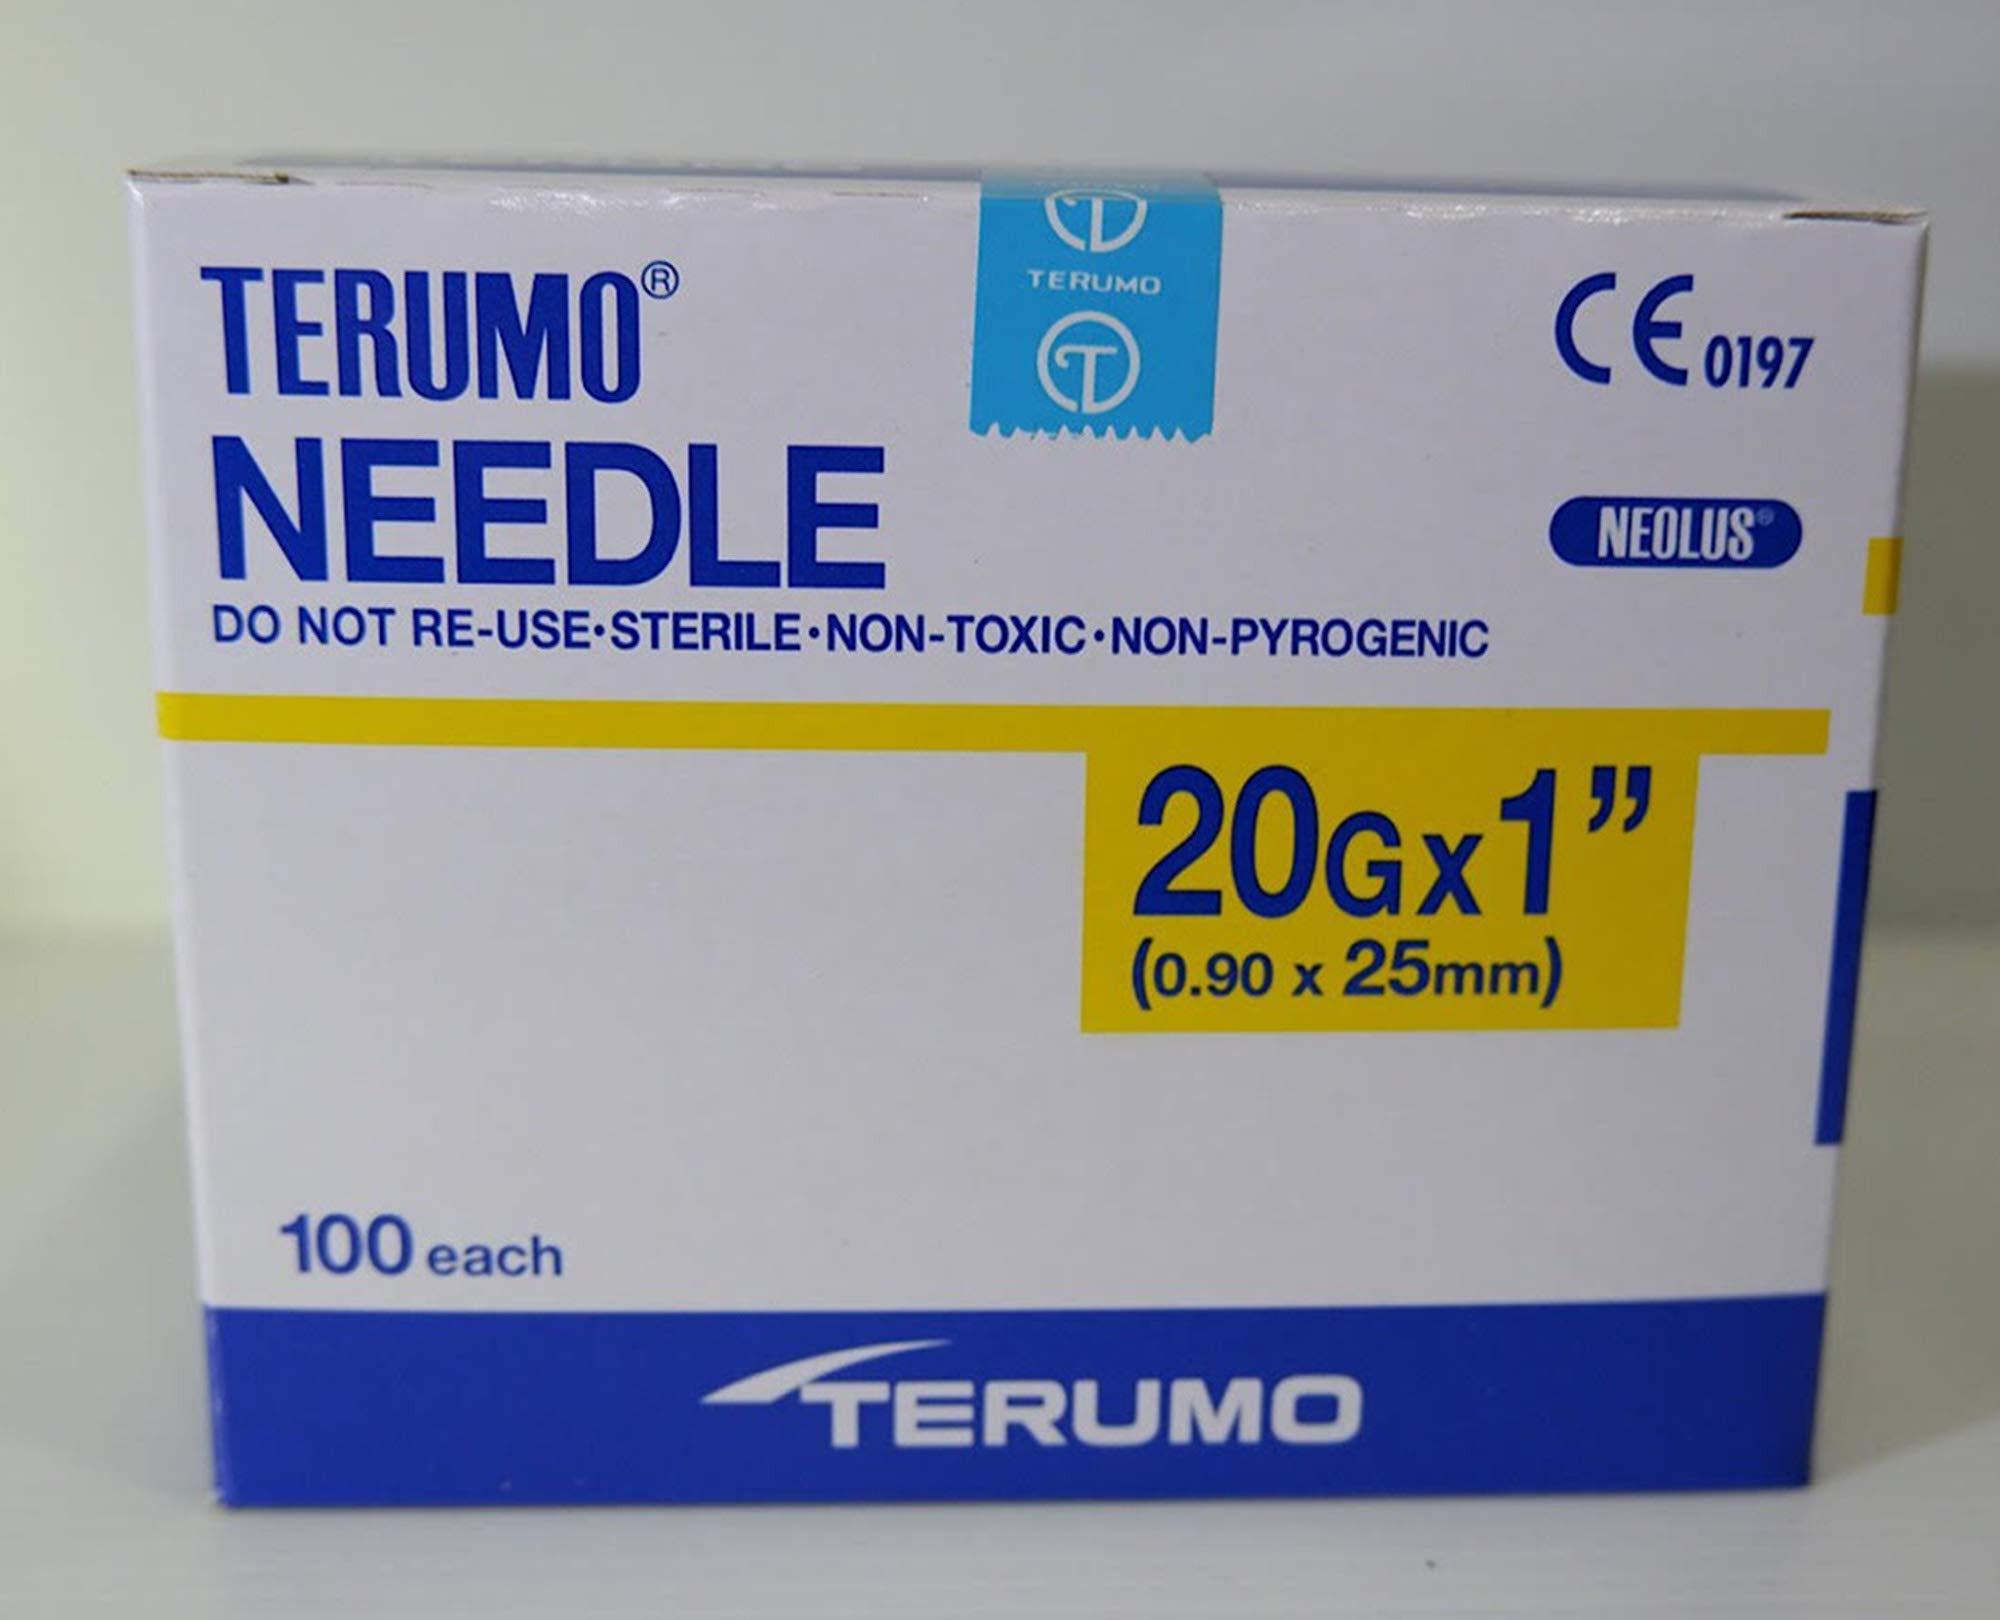 Terumo 20G x 1'' (0.90x25mm) 100 Each/Pack